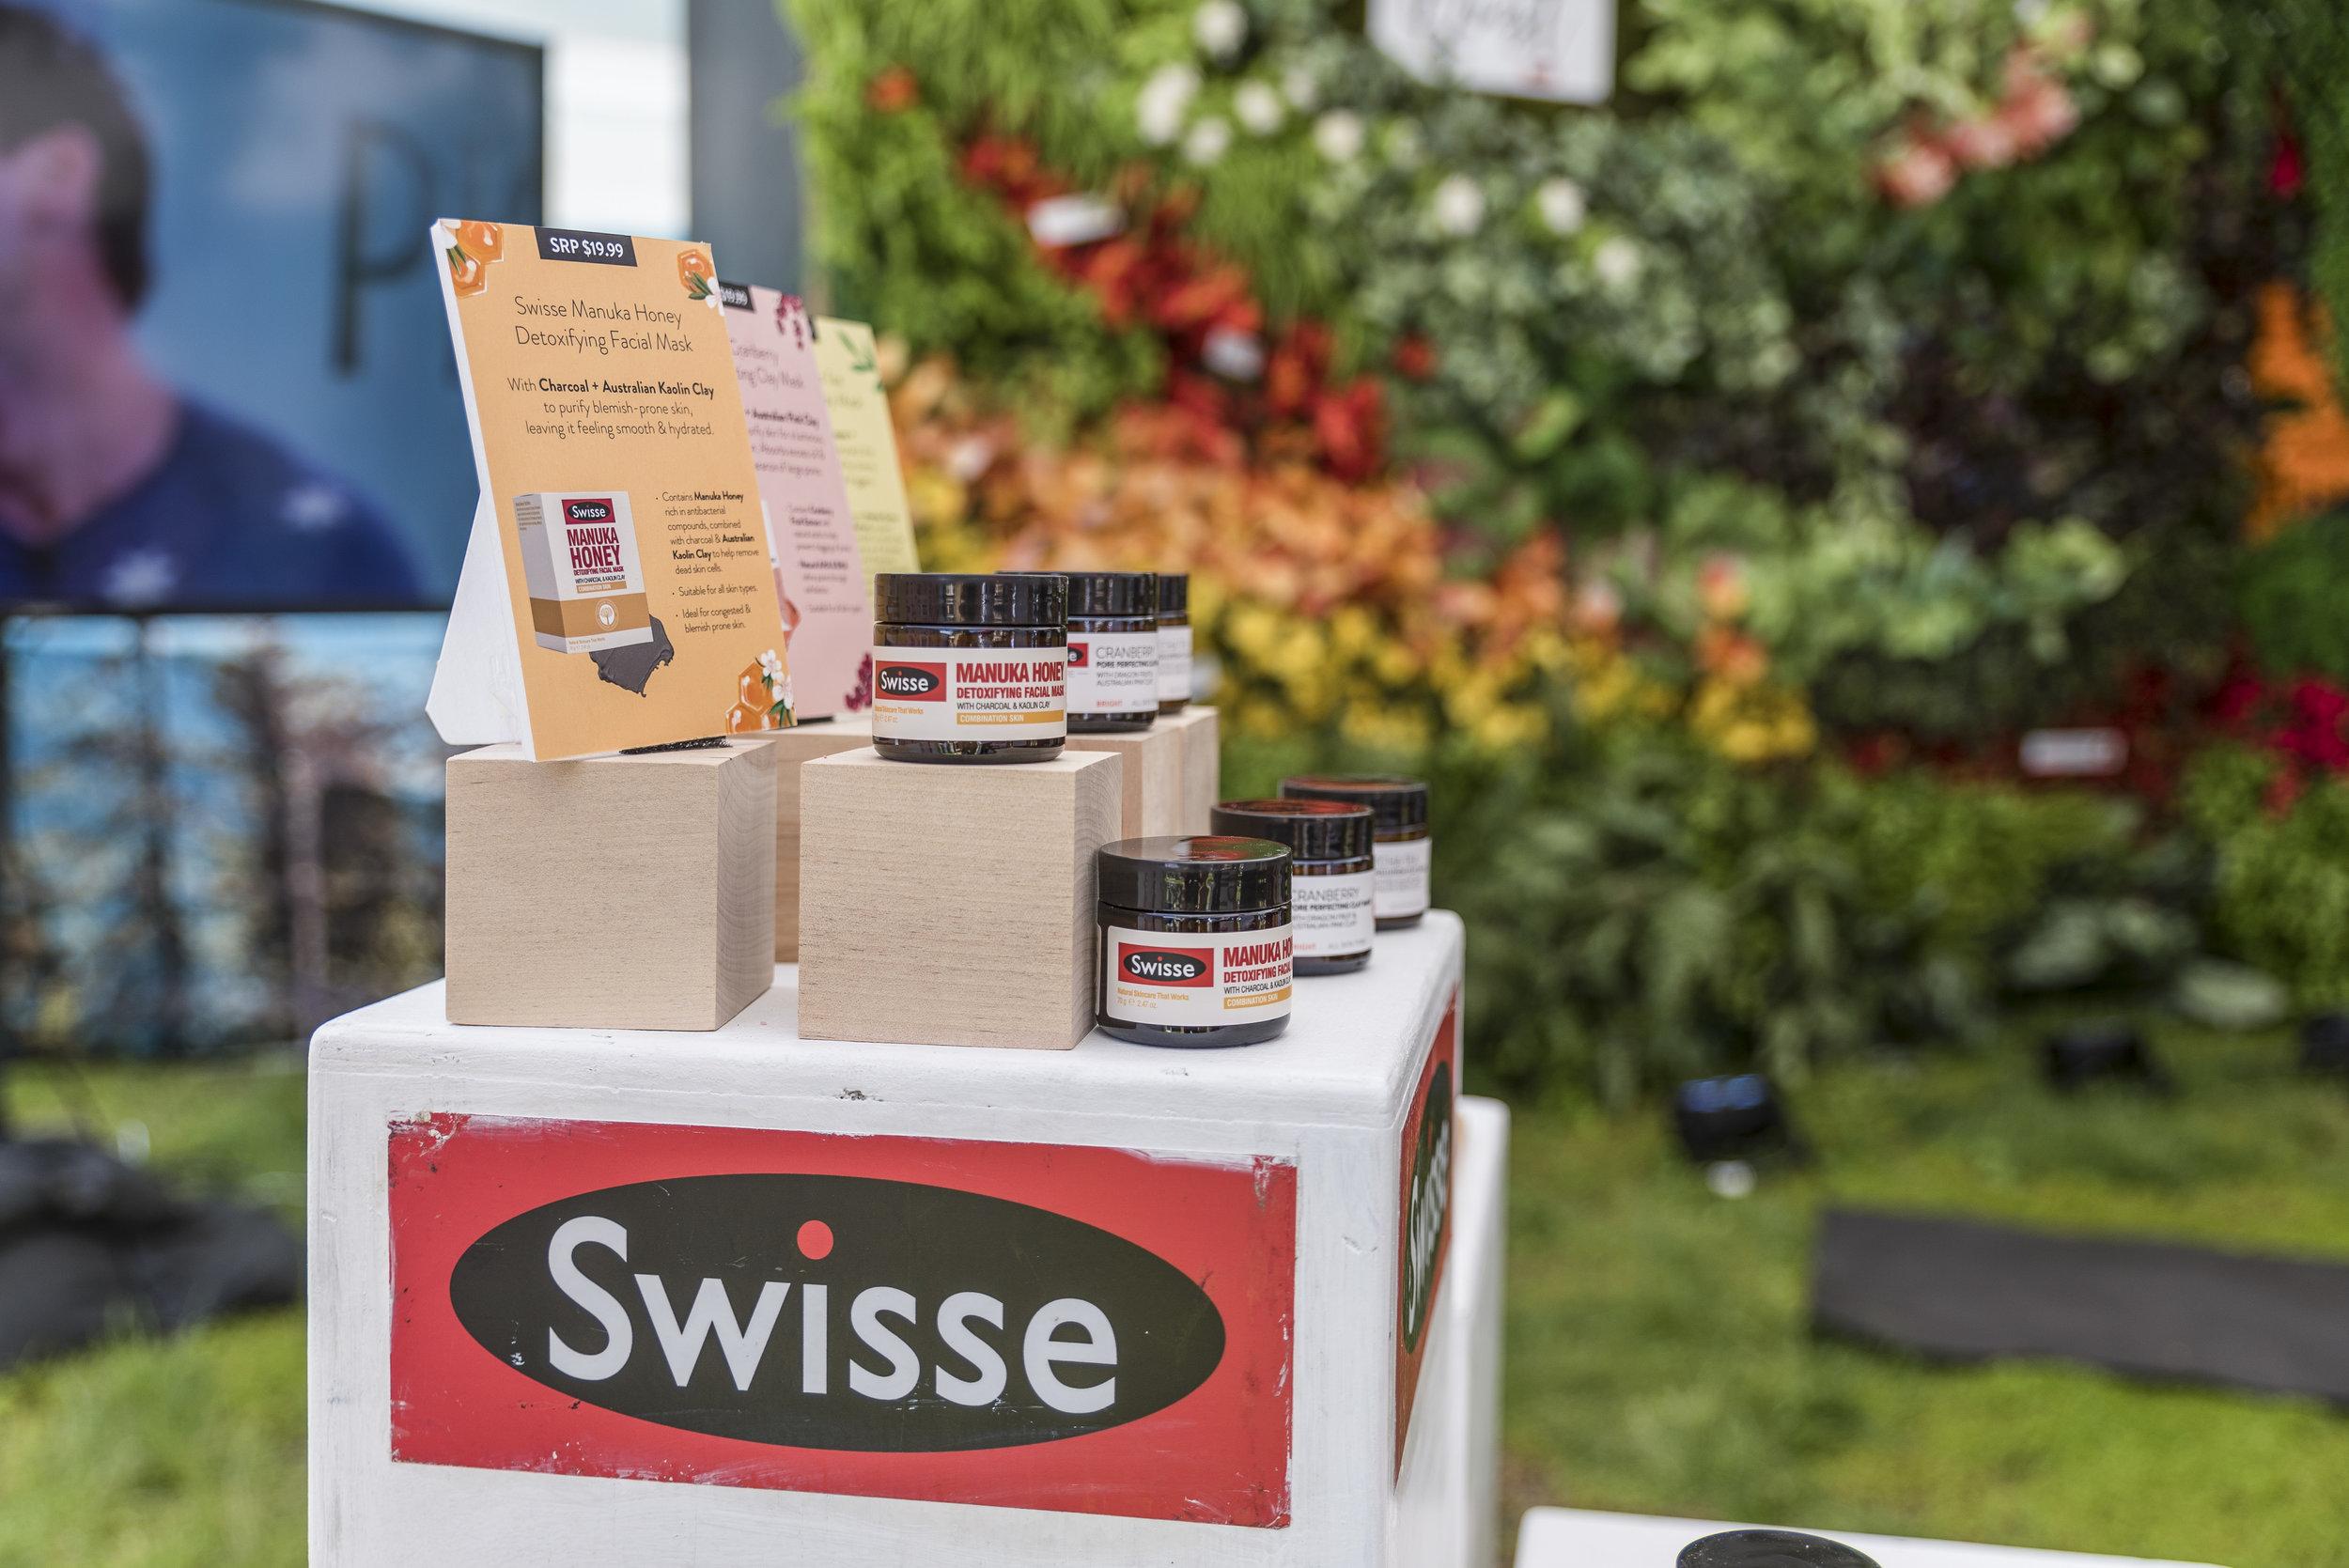 OHelloMedia-Swisse-Wanderlust185.jpg